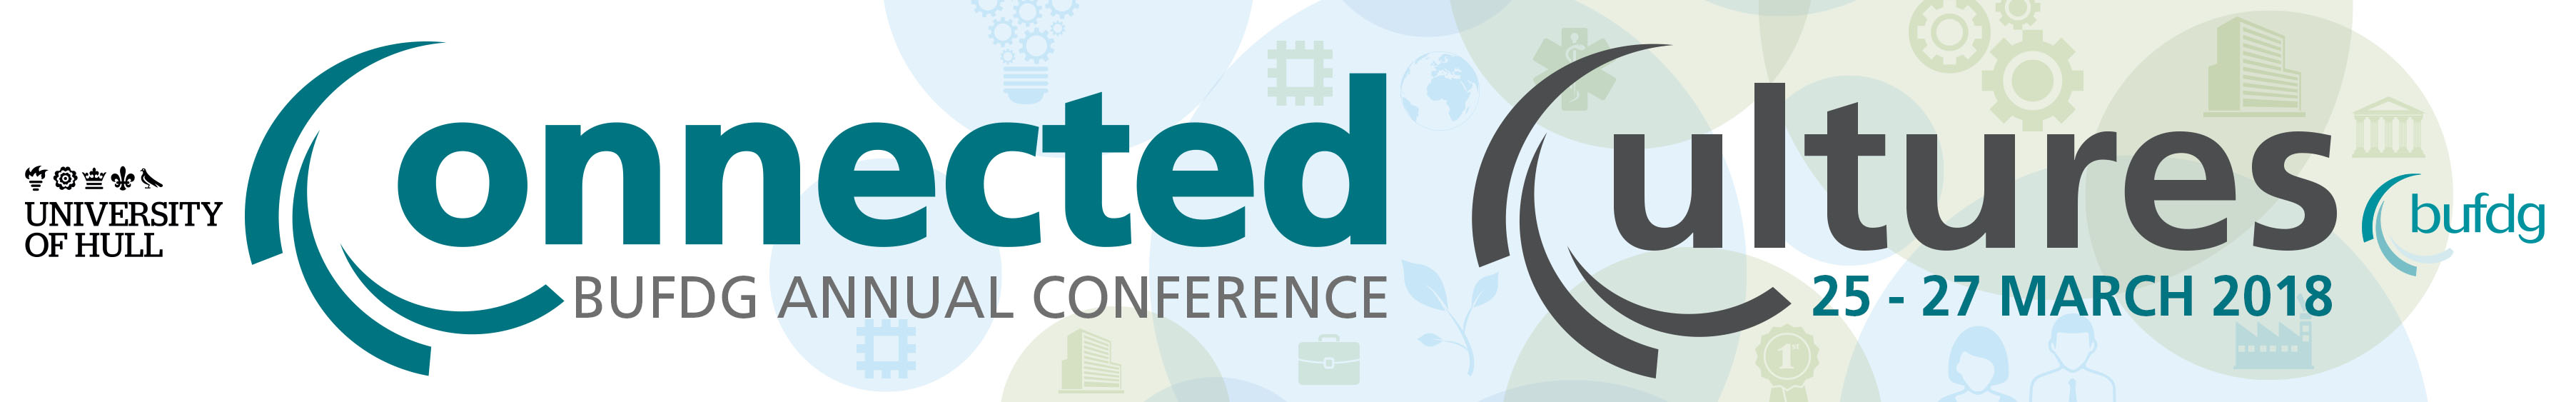 BUFDG Annual Conference 2018 - Delegates